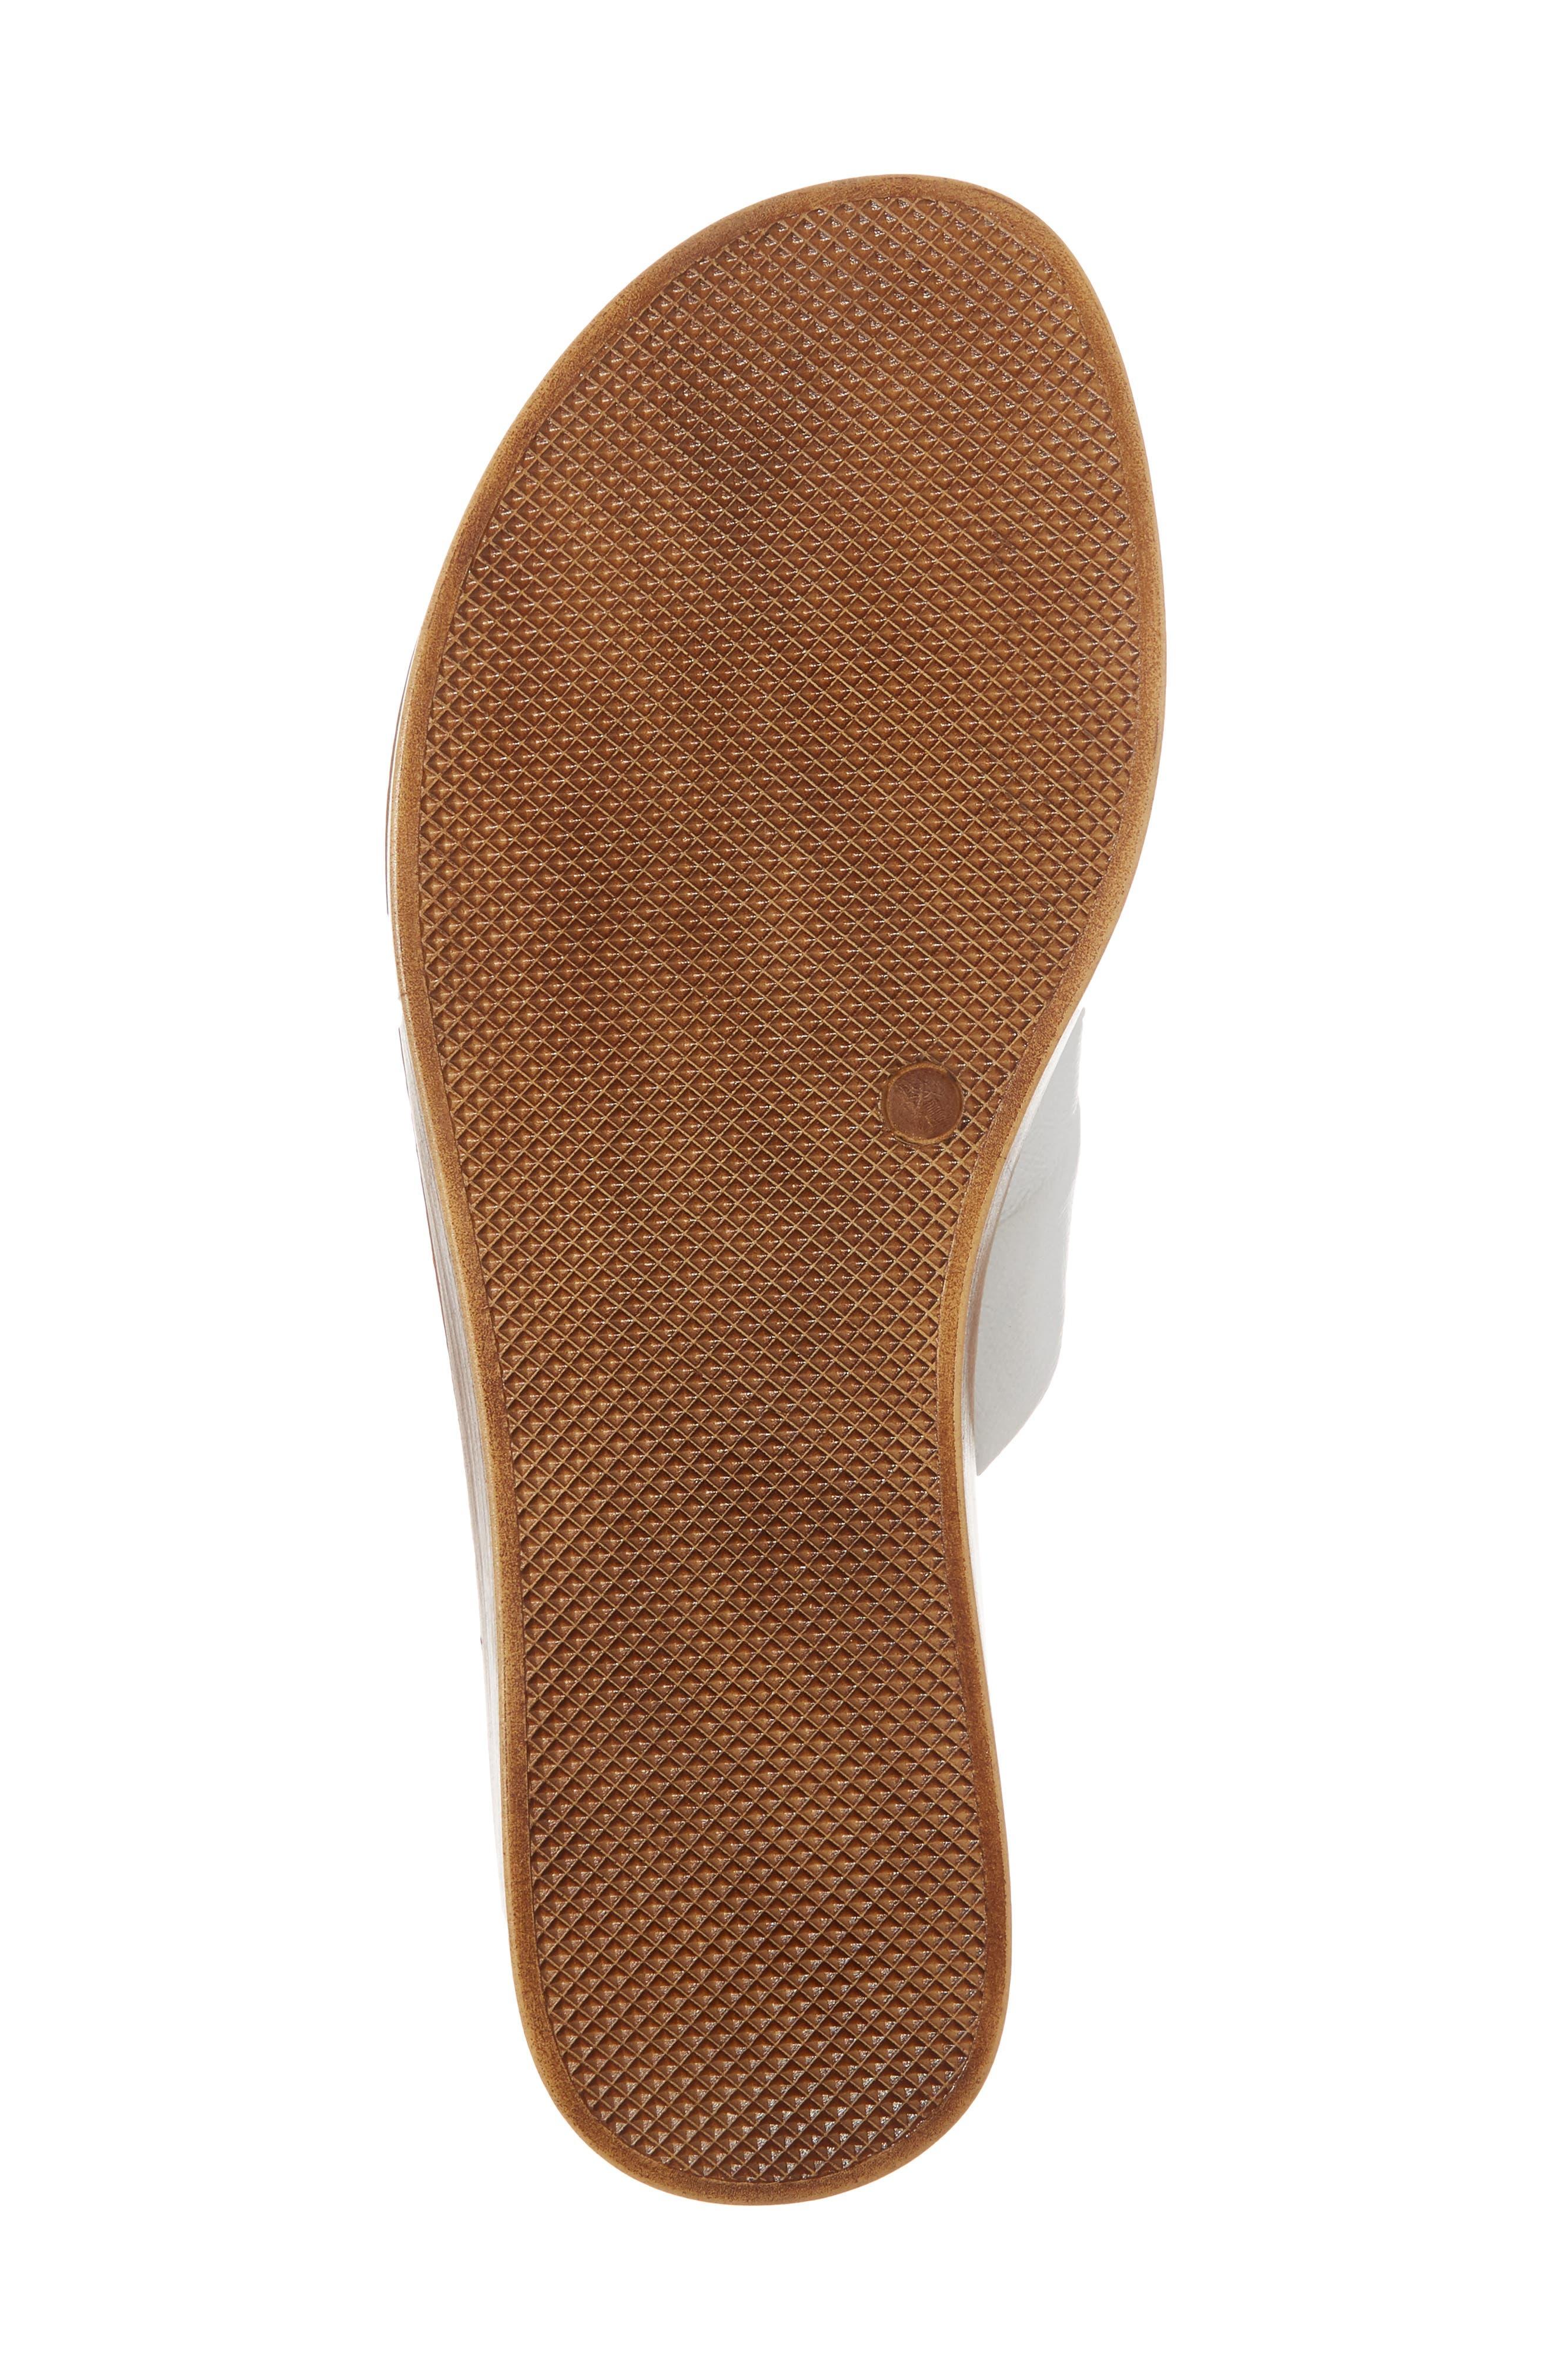 Noa Slide Sandal,                             Alternate thumbnail 6, color,                             White Leather